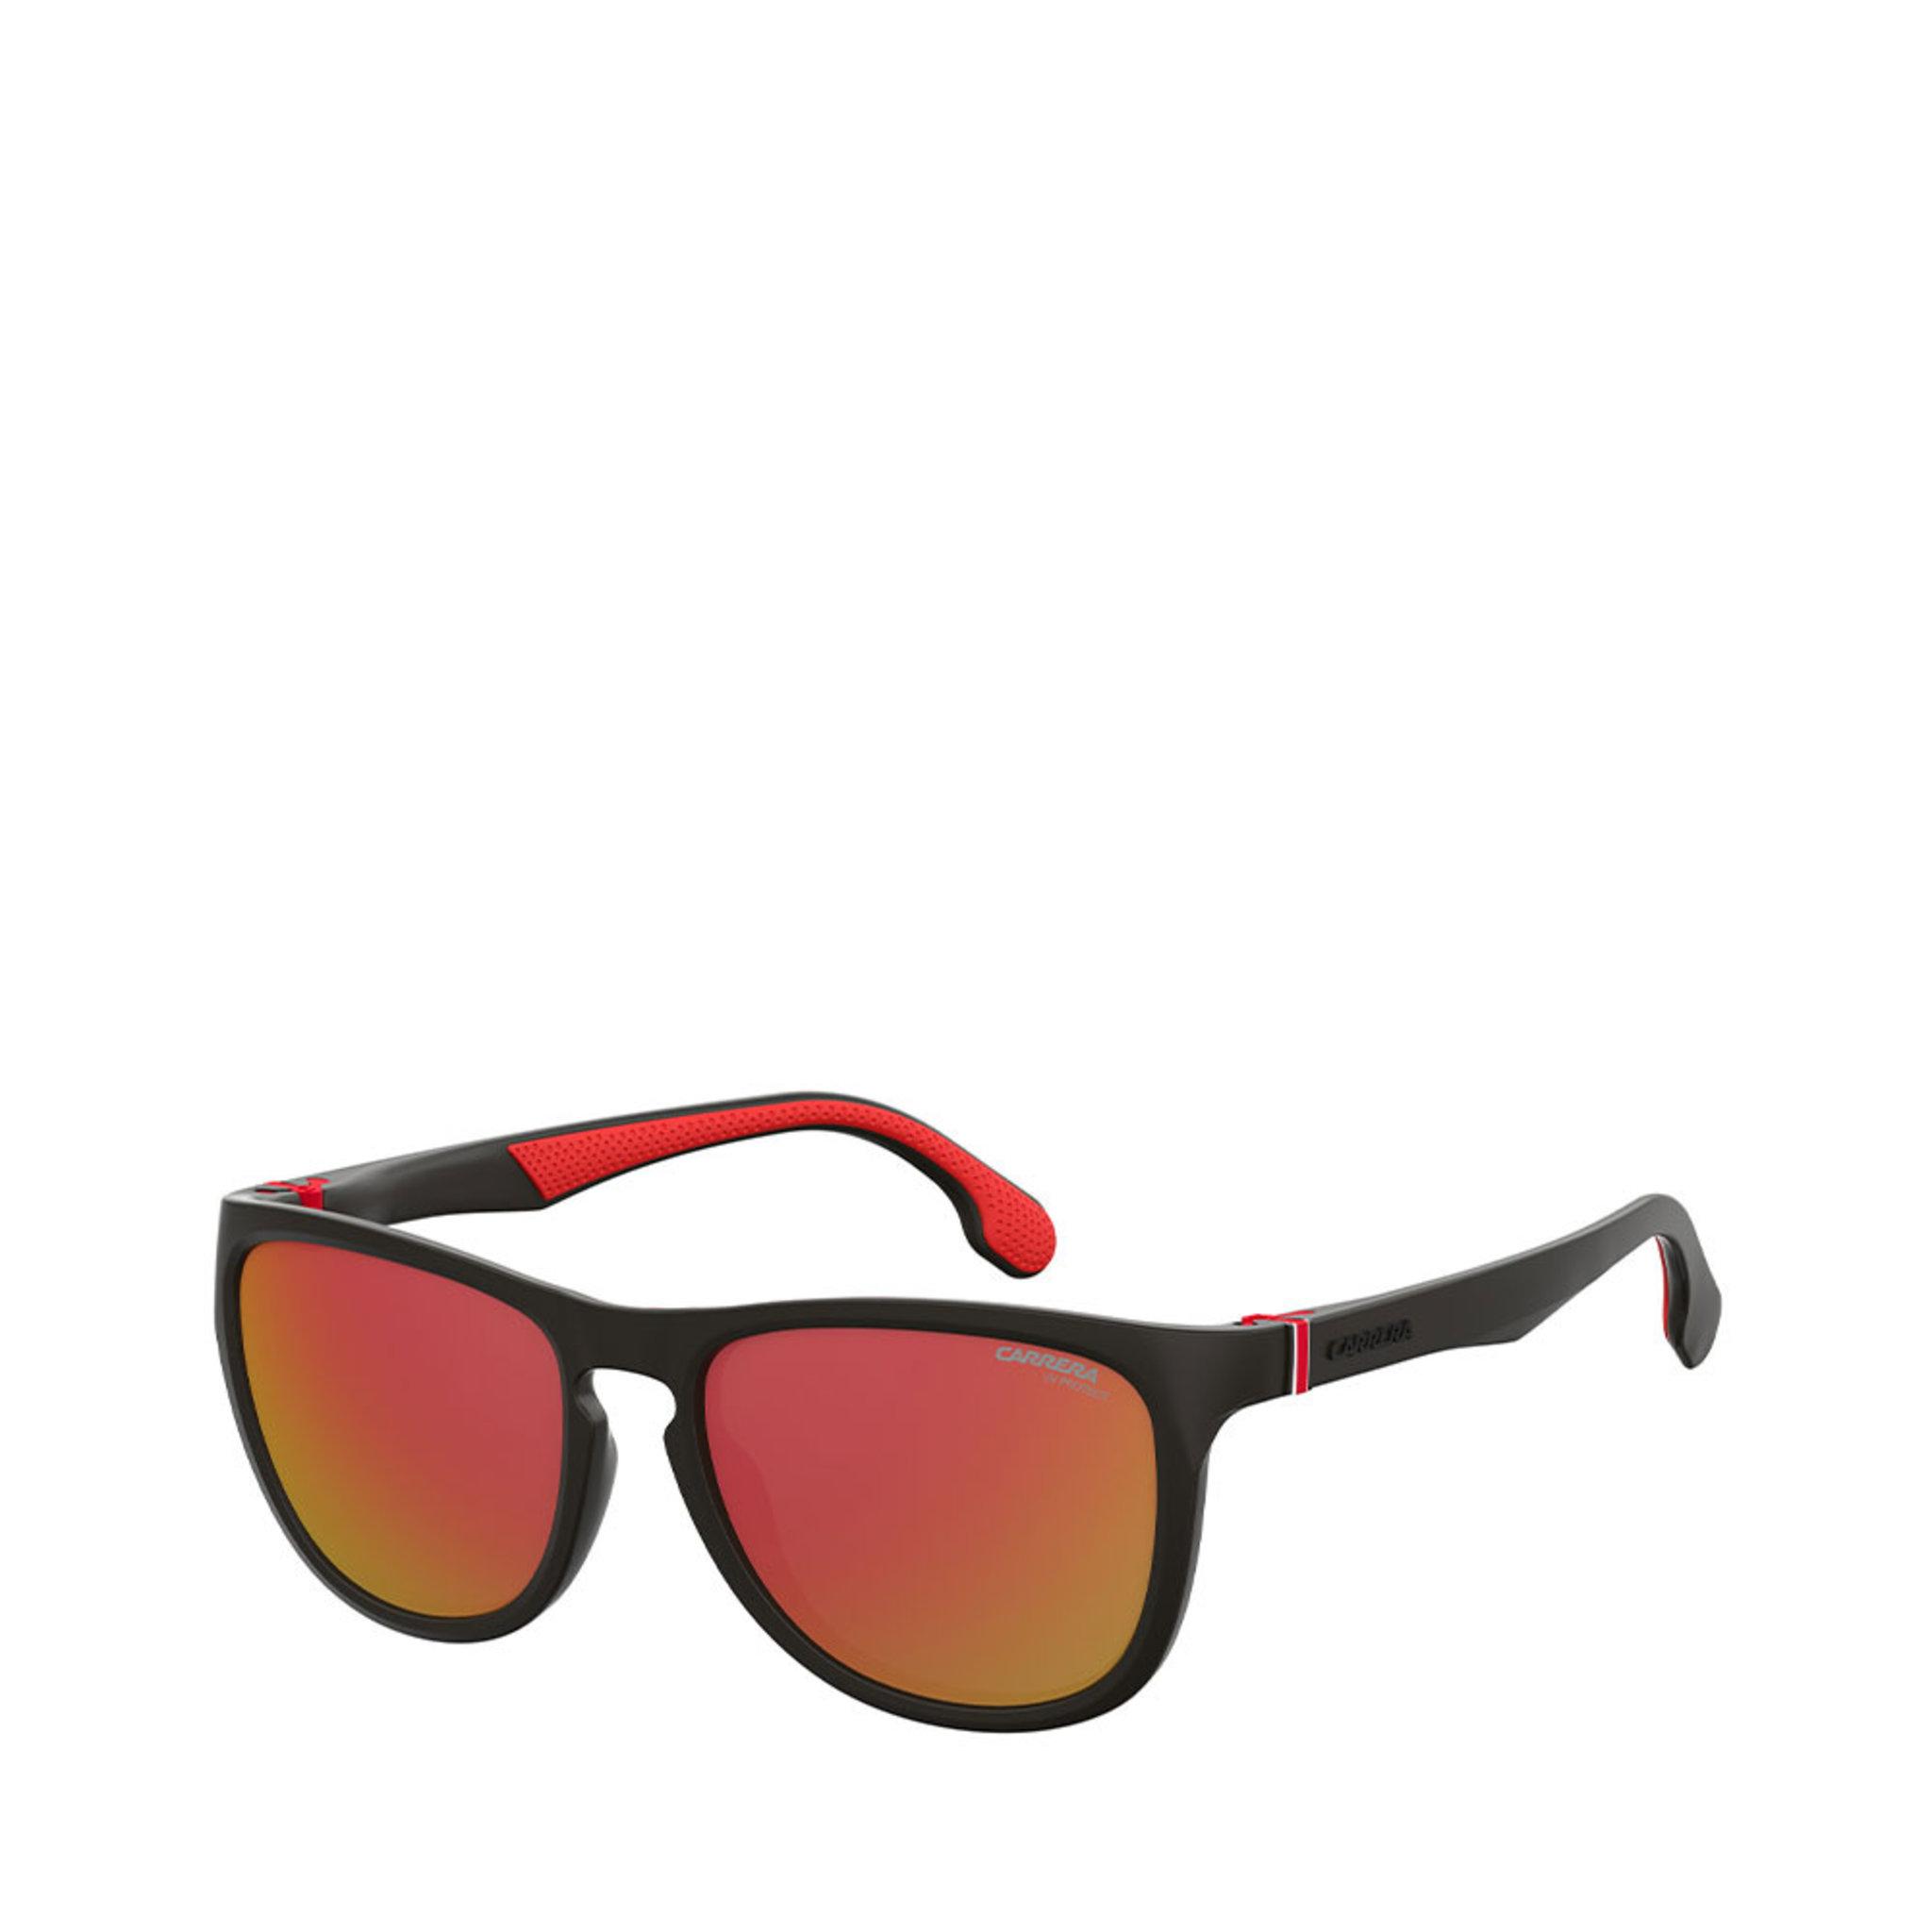 Sunglasses 5050/S, 5618